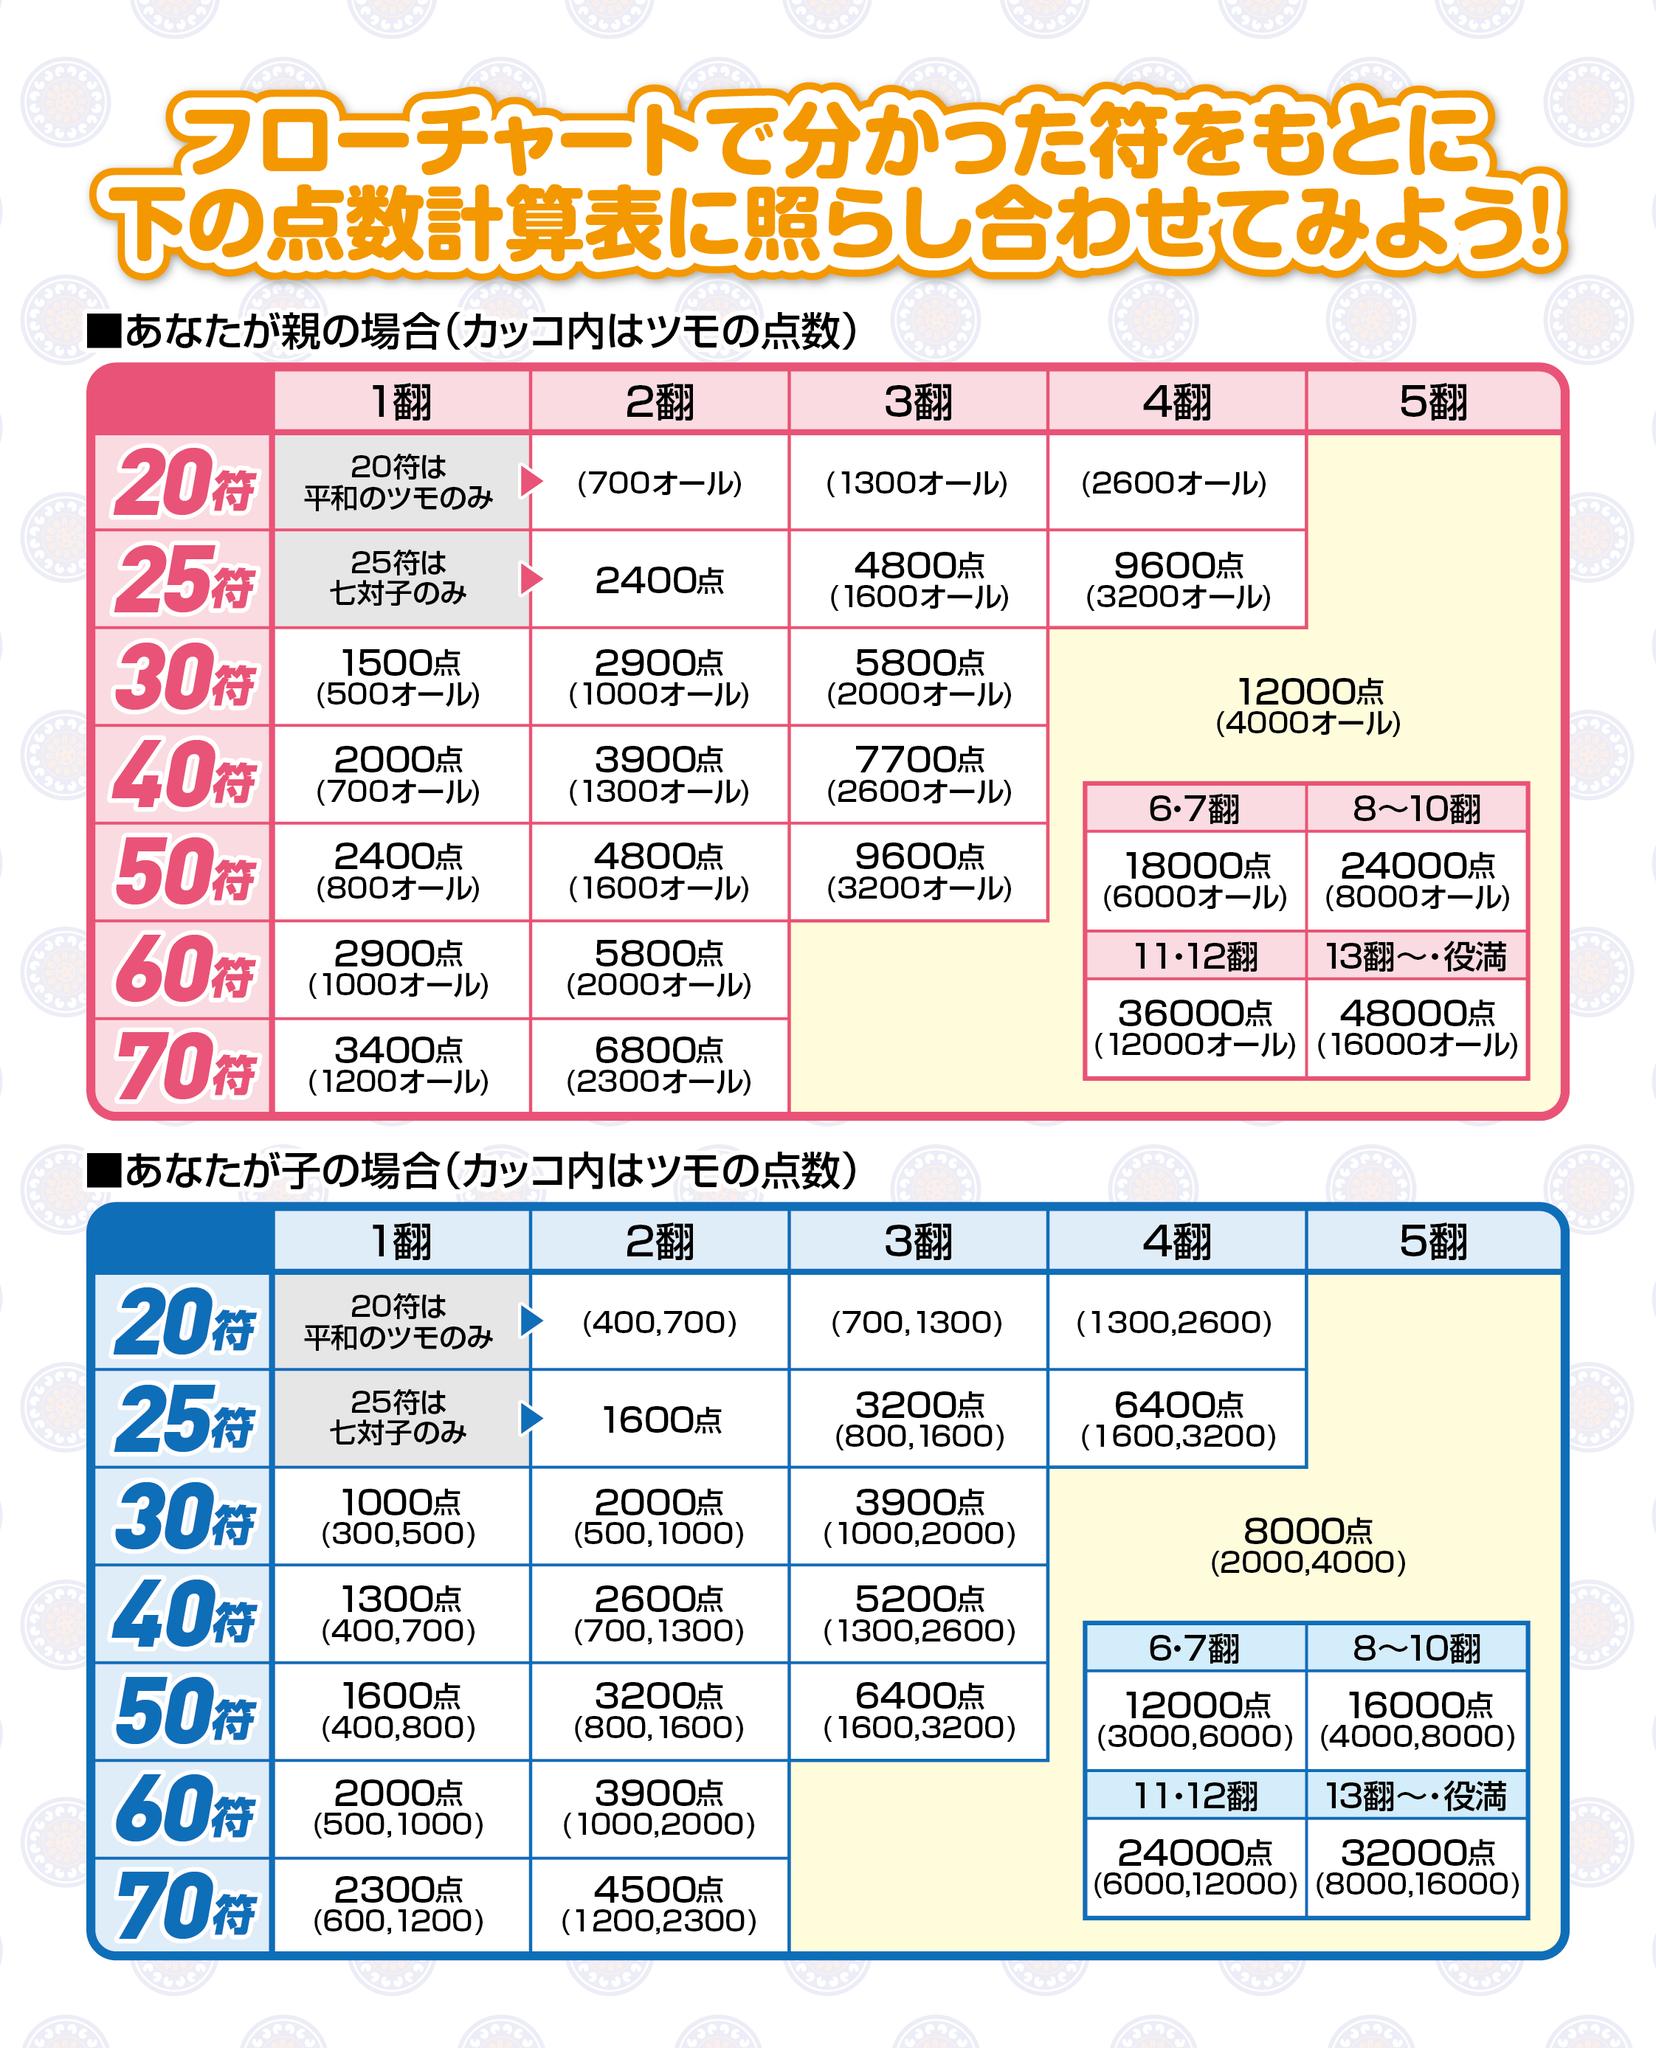 09F36C19-9C36-44B5-8A76-7147B5DAEC8C